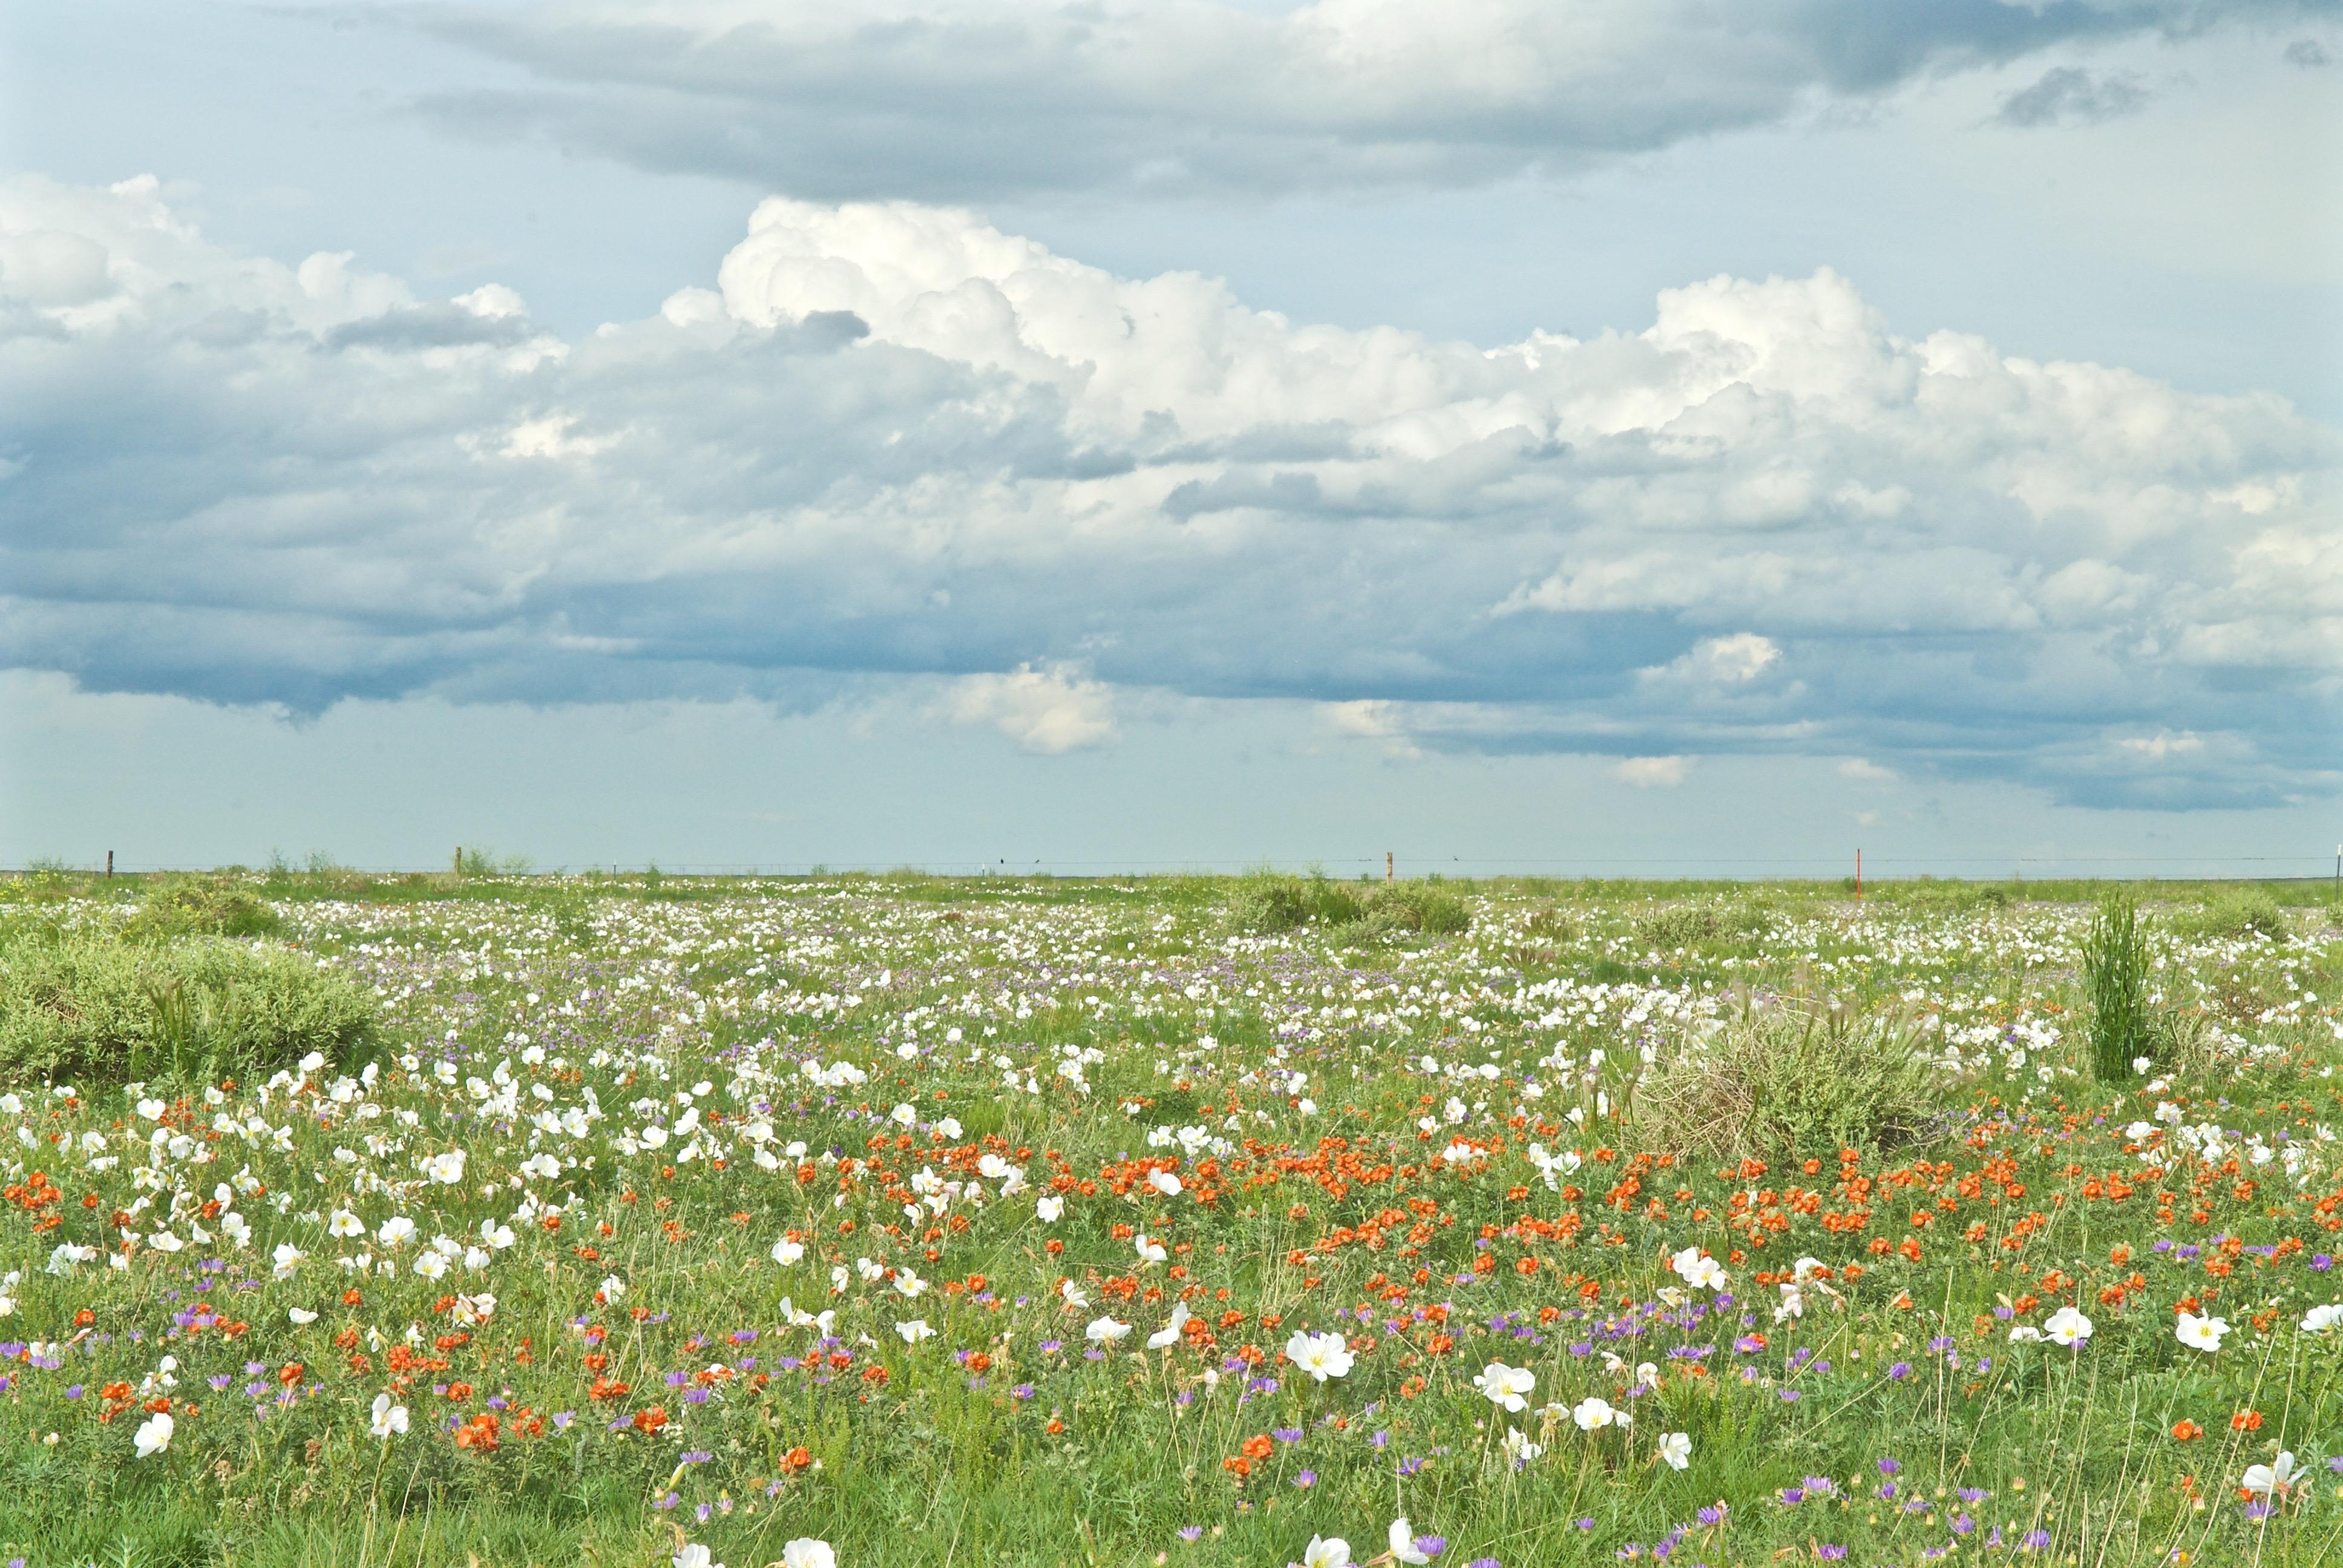 Pawnee Grasslands (Tansyaster, Primrose, Scarlet Mallow)